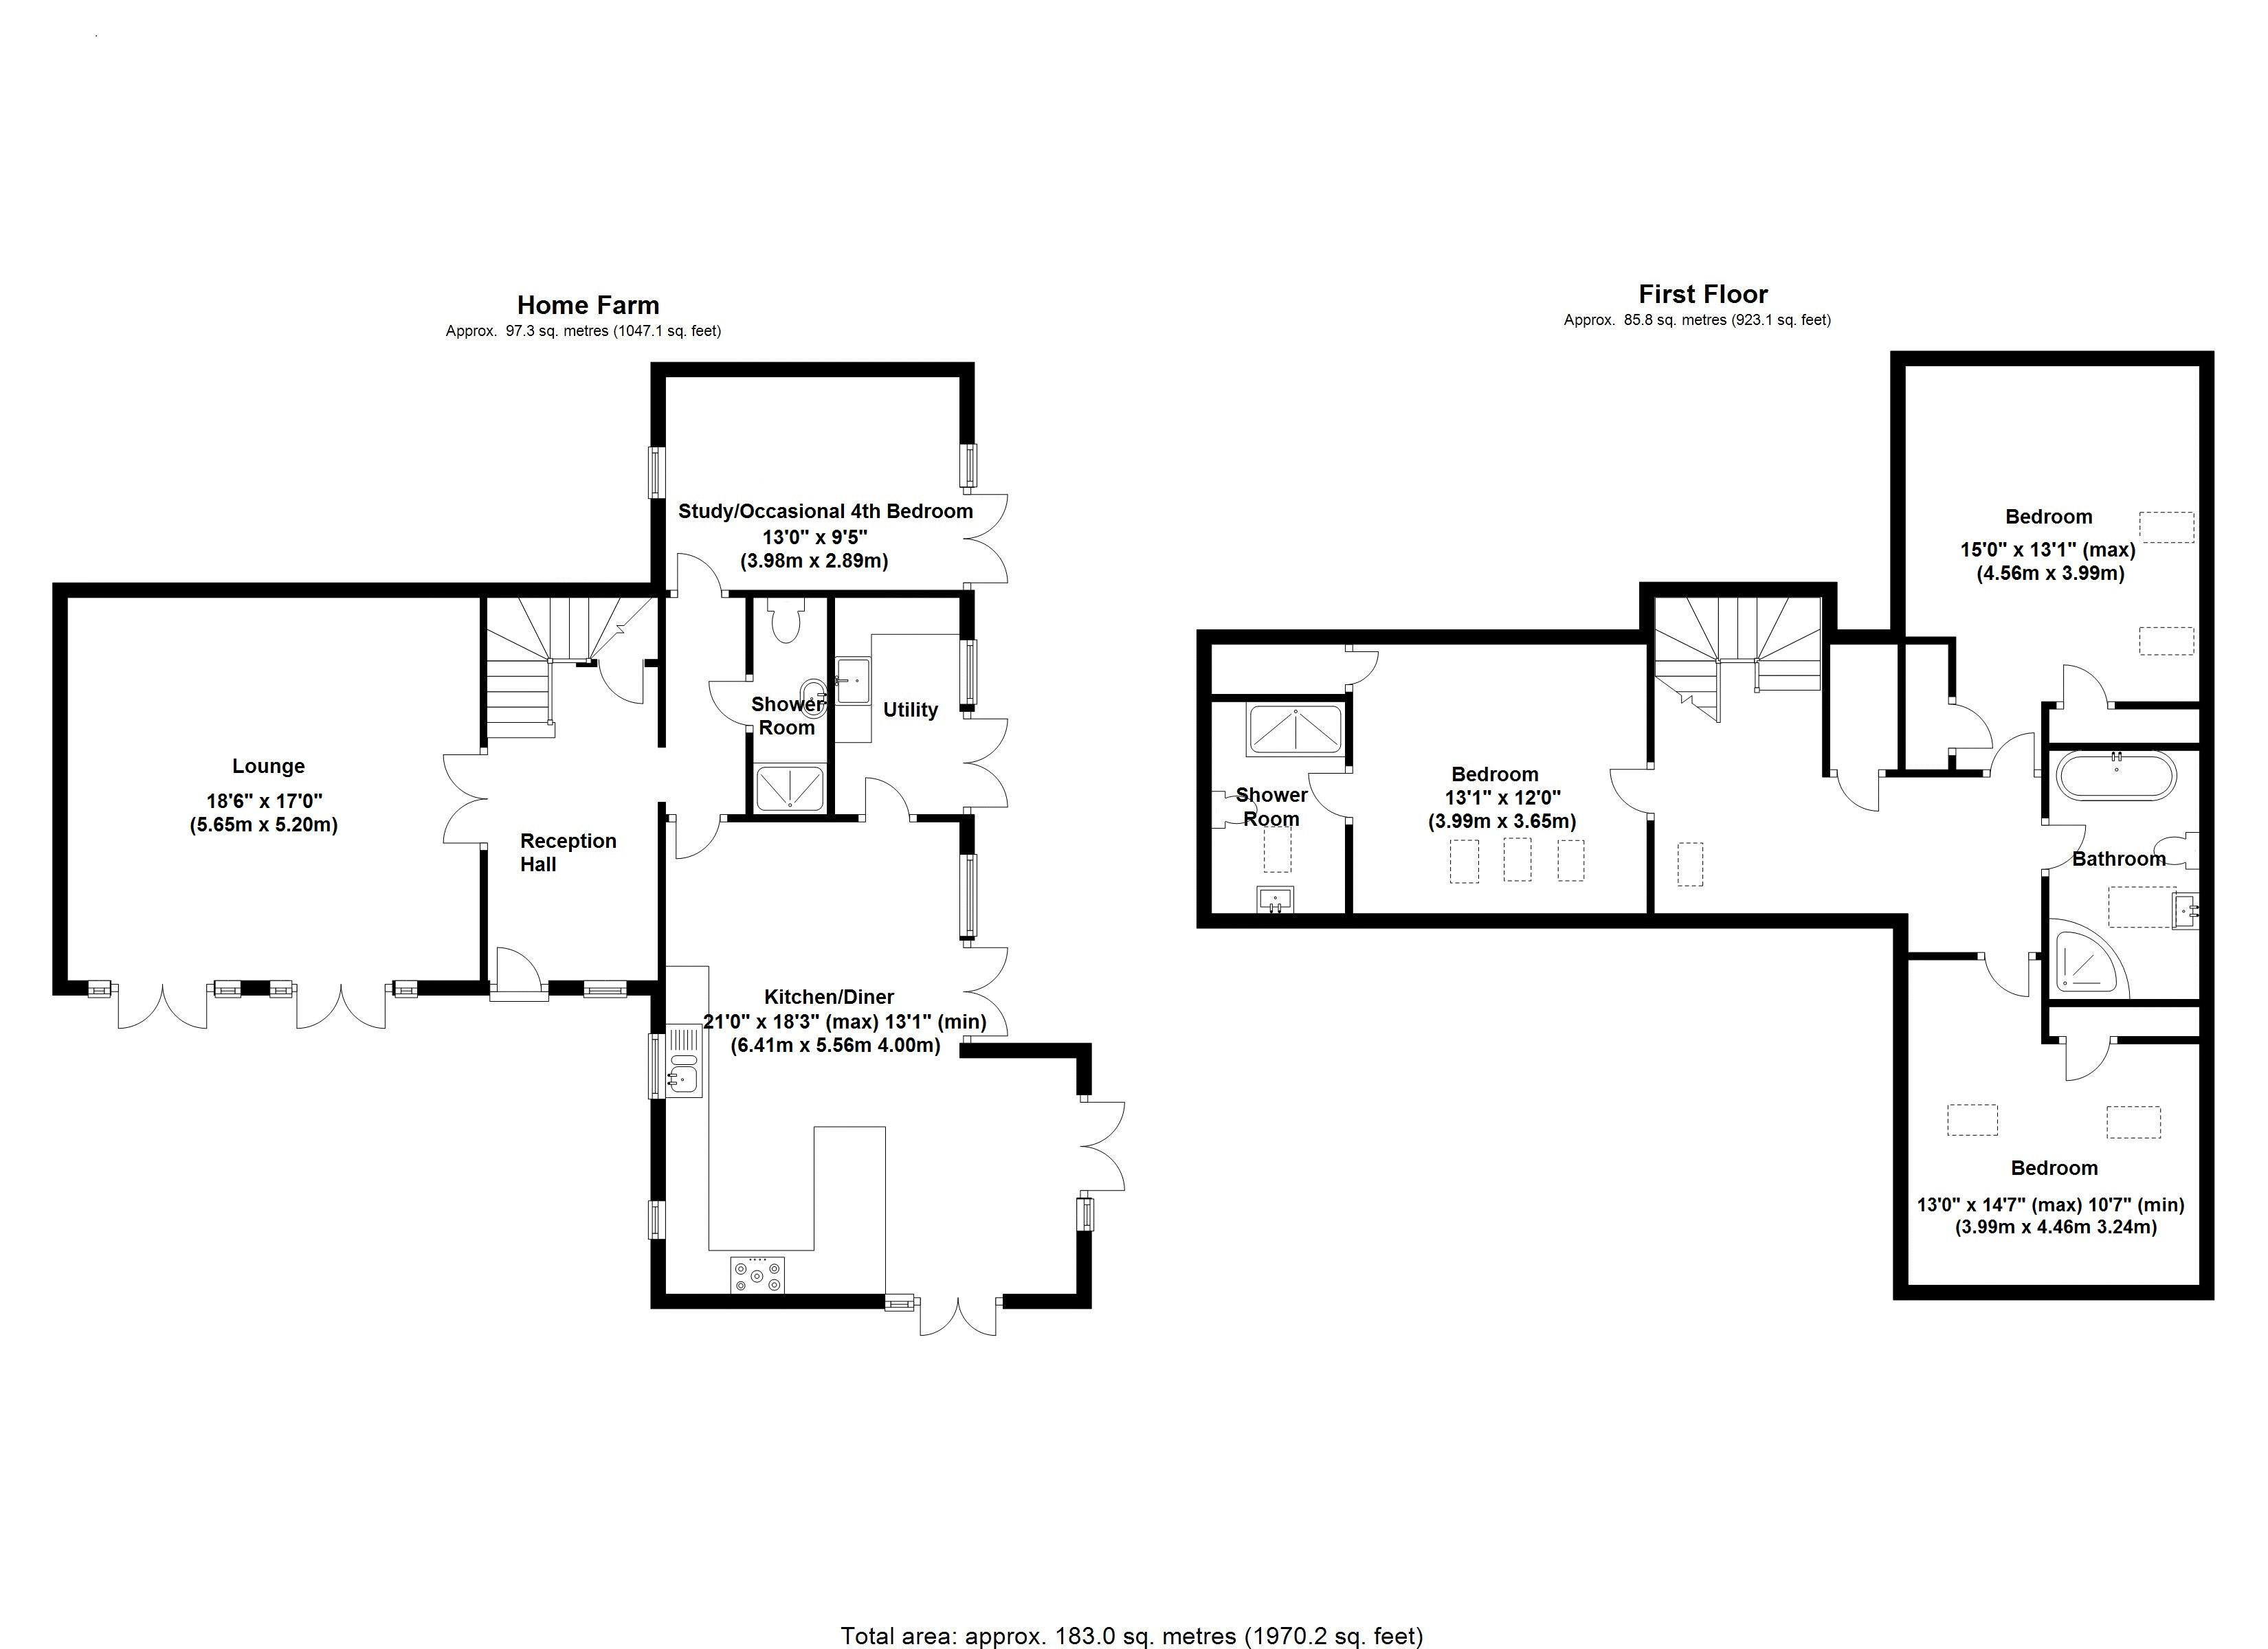 Home Farm Stables - Floor Plan